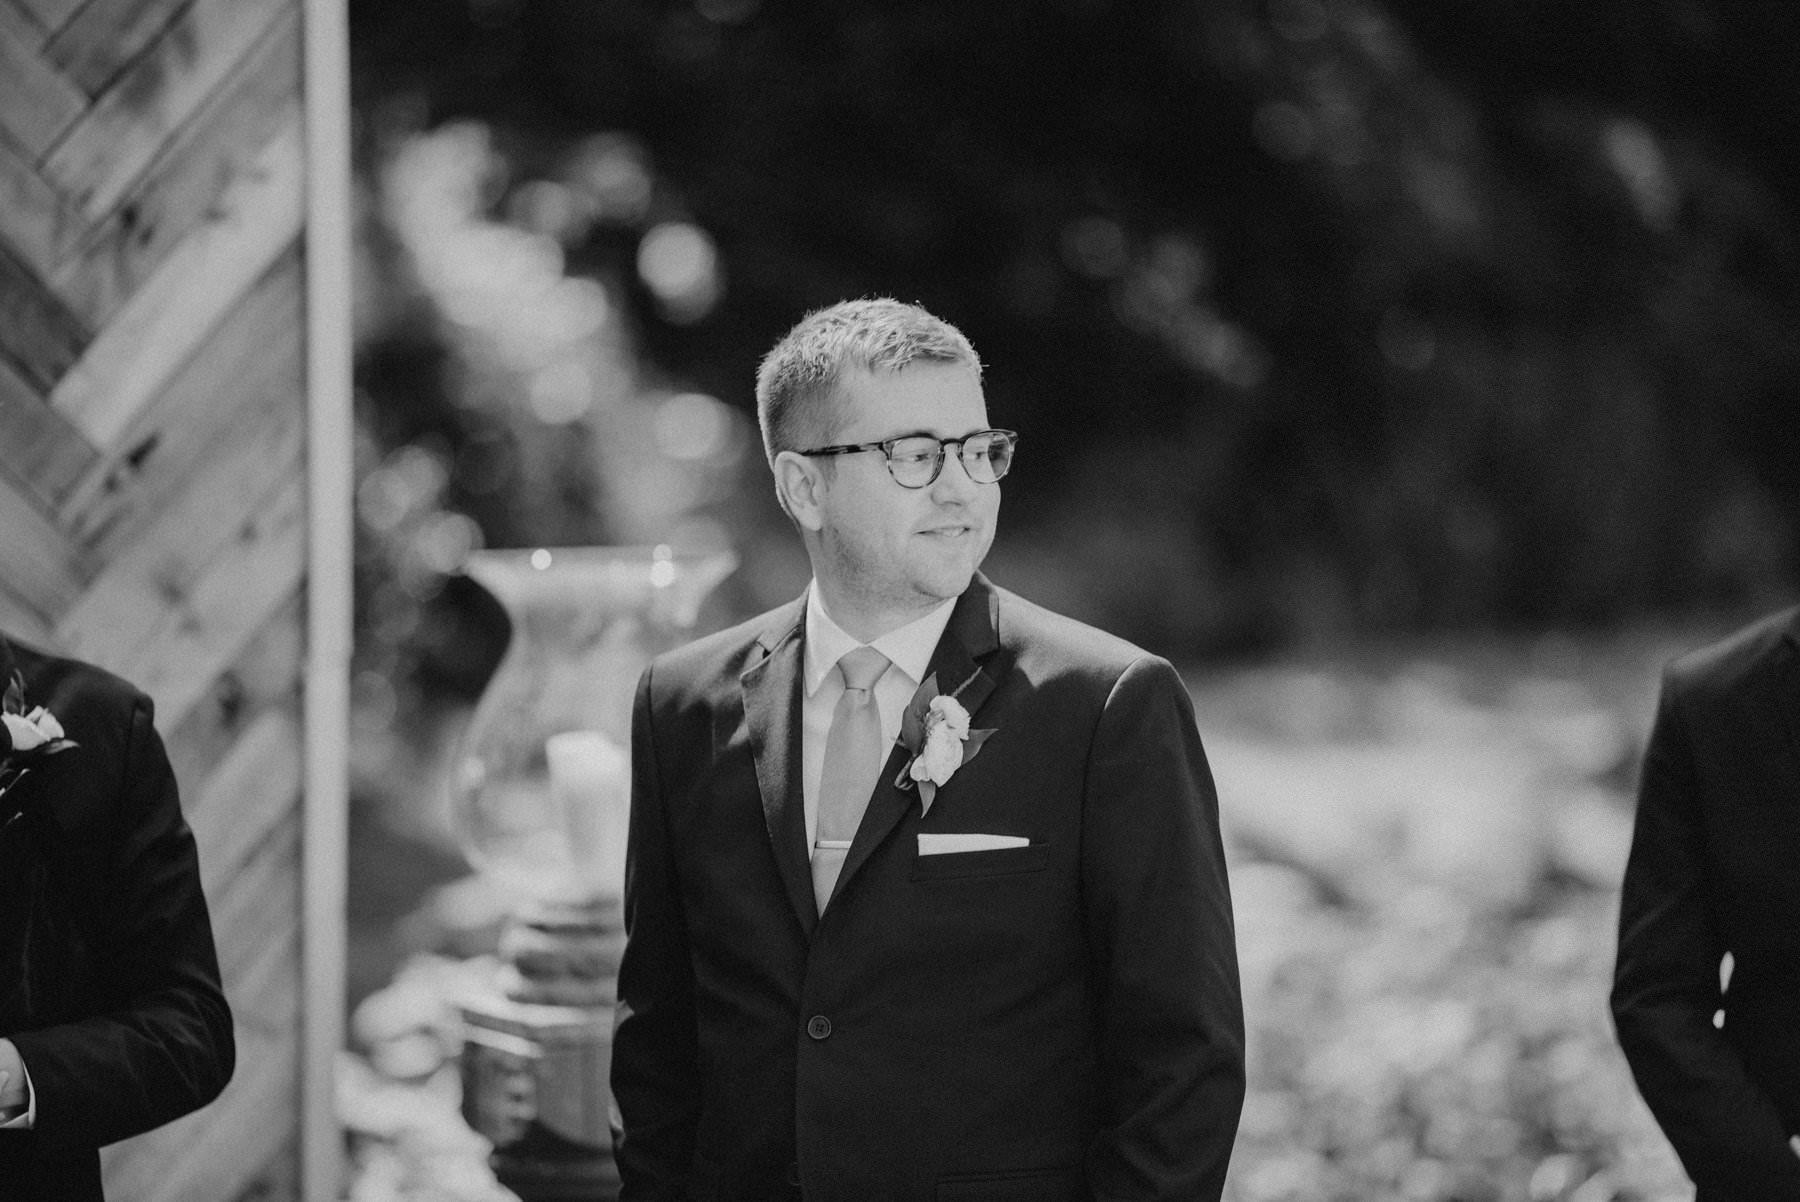 Appleford-estate-wedding-82.jpg